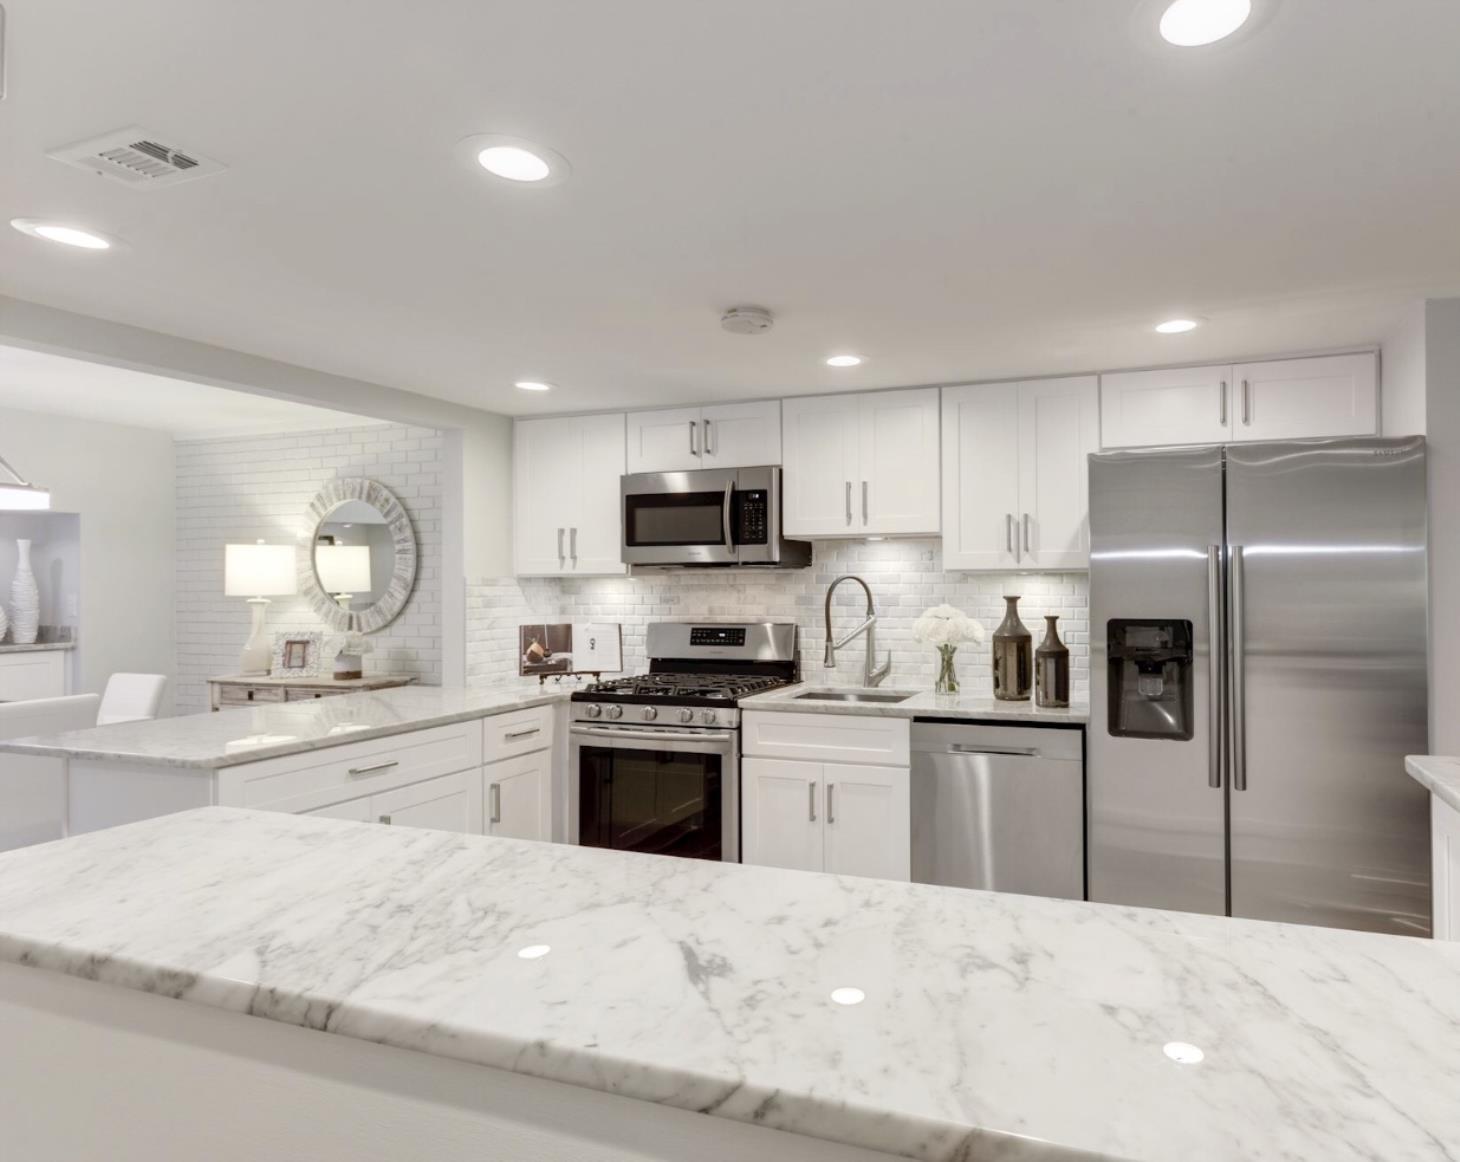 Virginia Home Design image 0